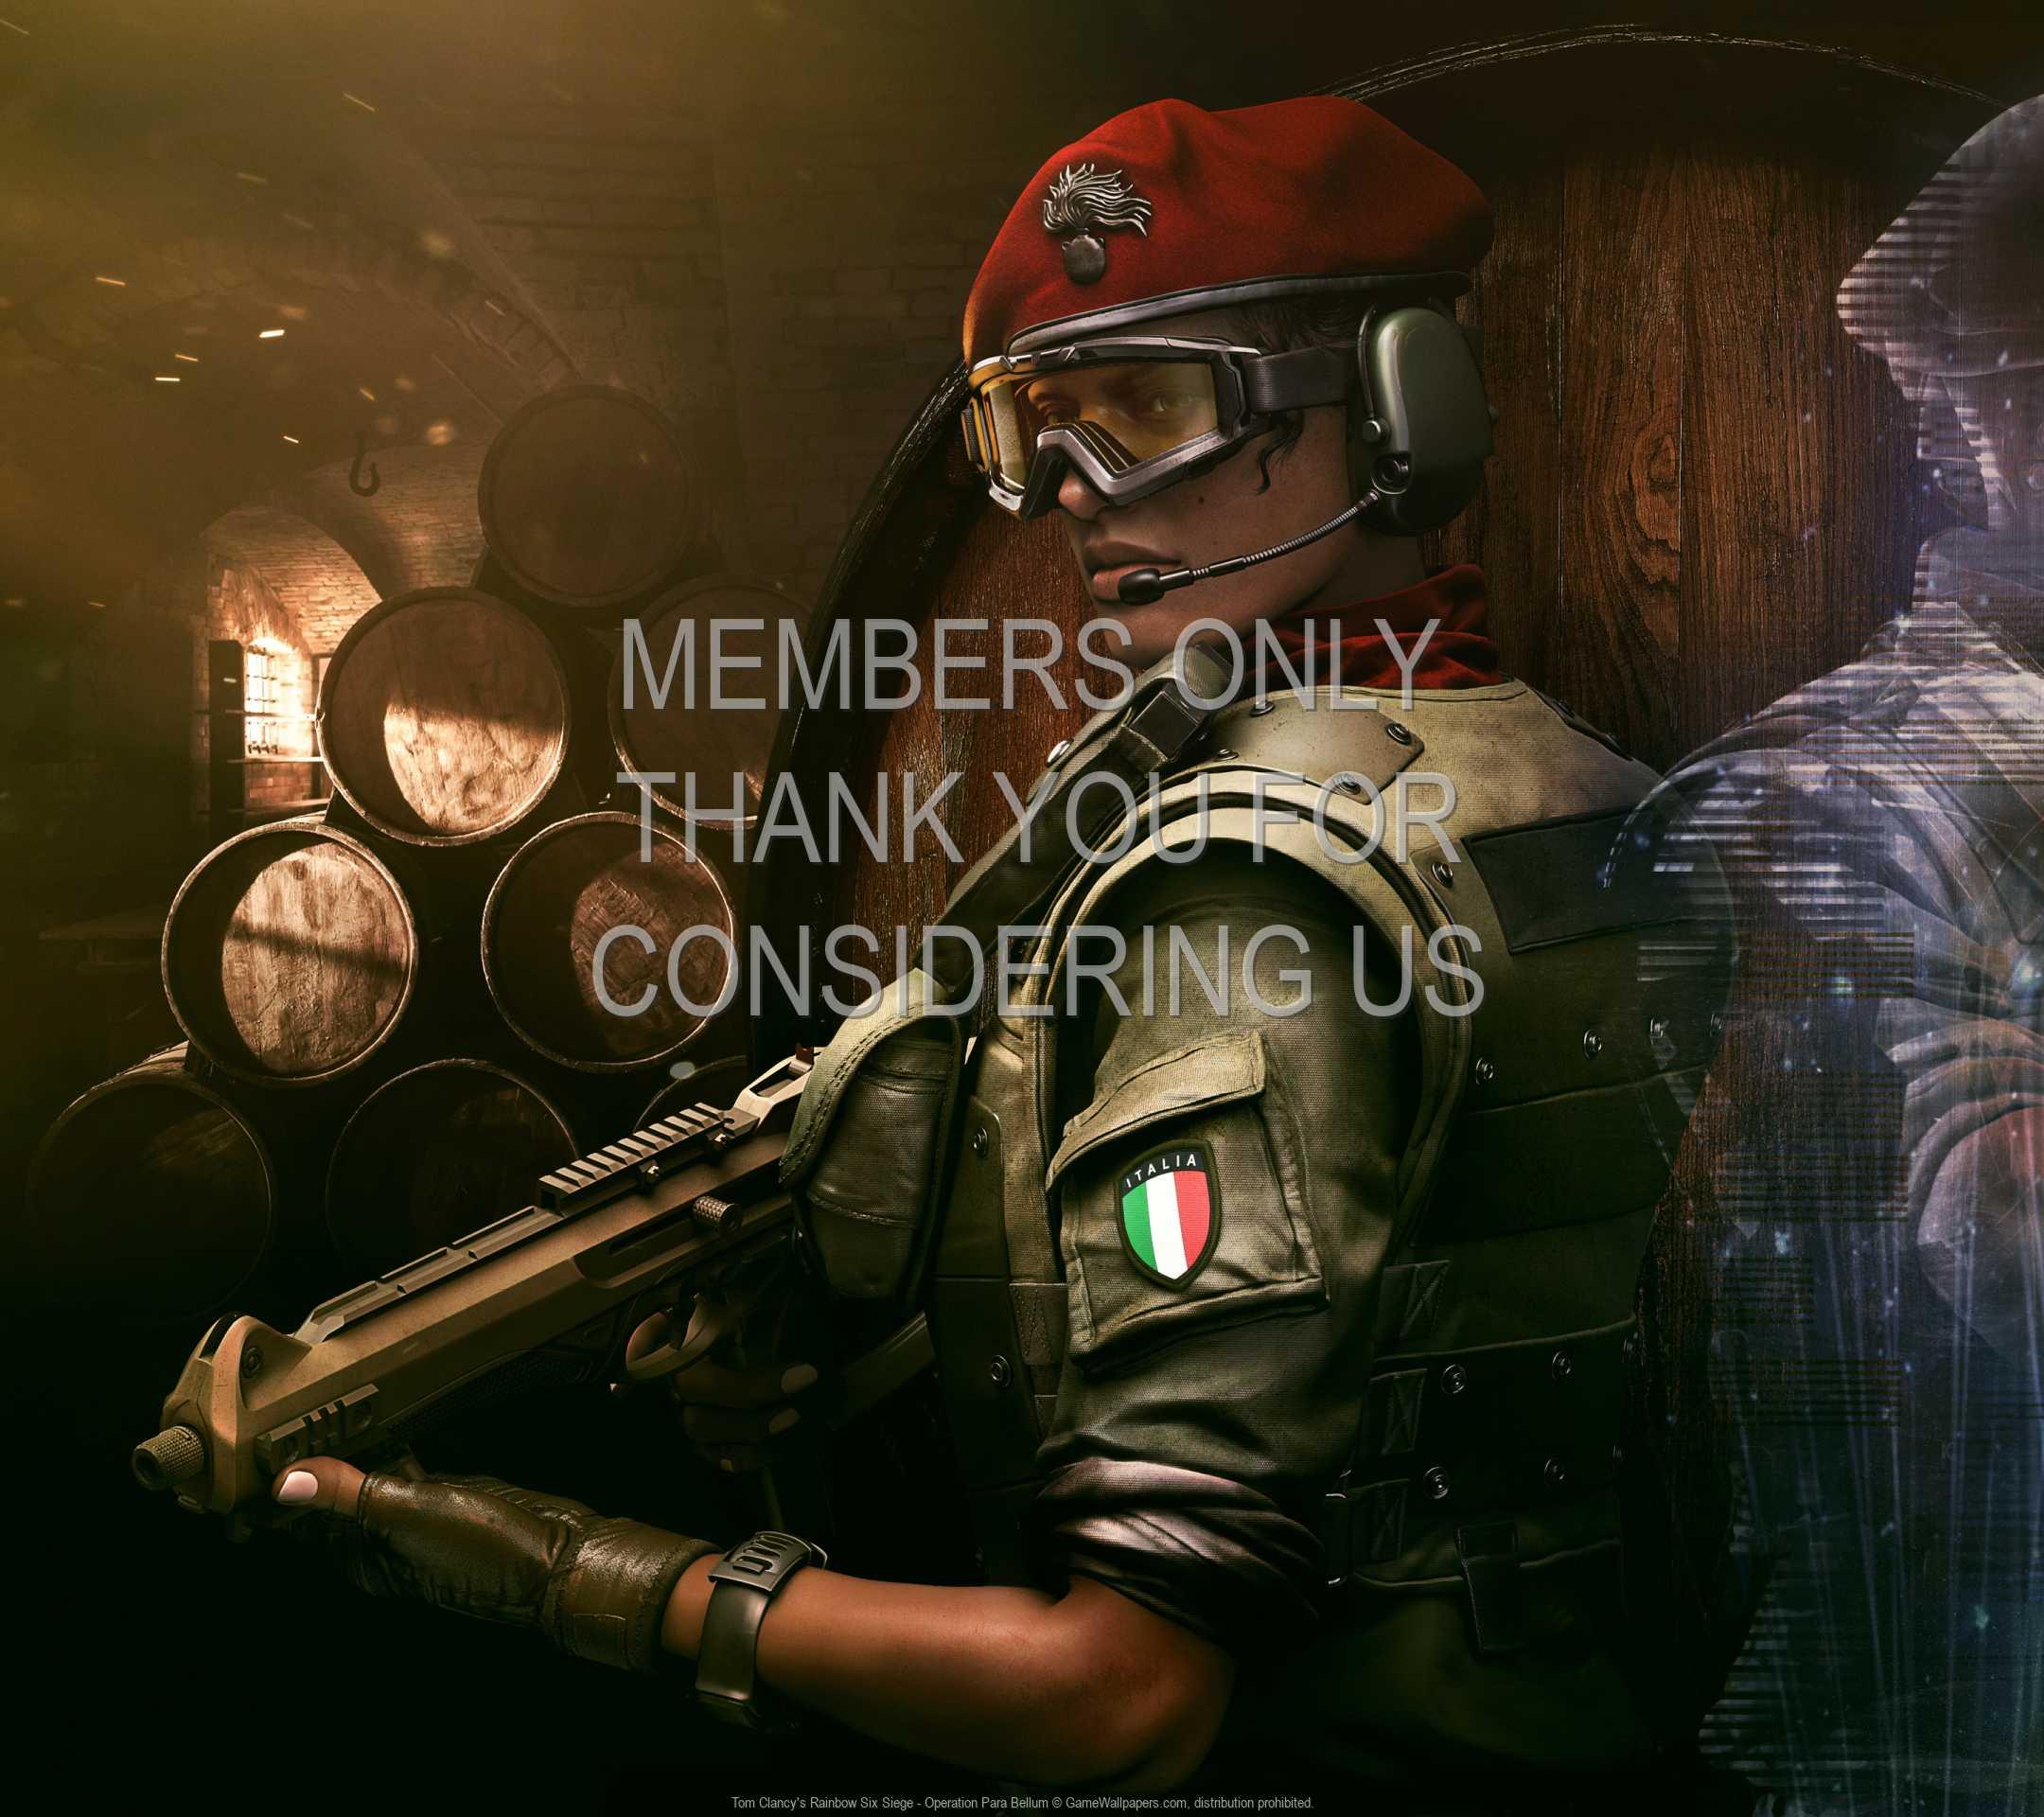 Tom Clancy's Rainbow Six: Siege - Operation Para Bellum 1080p Horizontal Mobile wallpaper or background 02